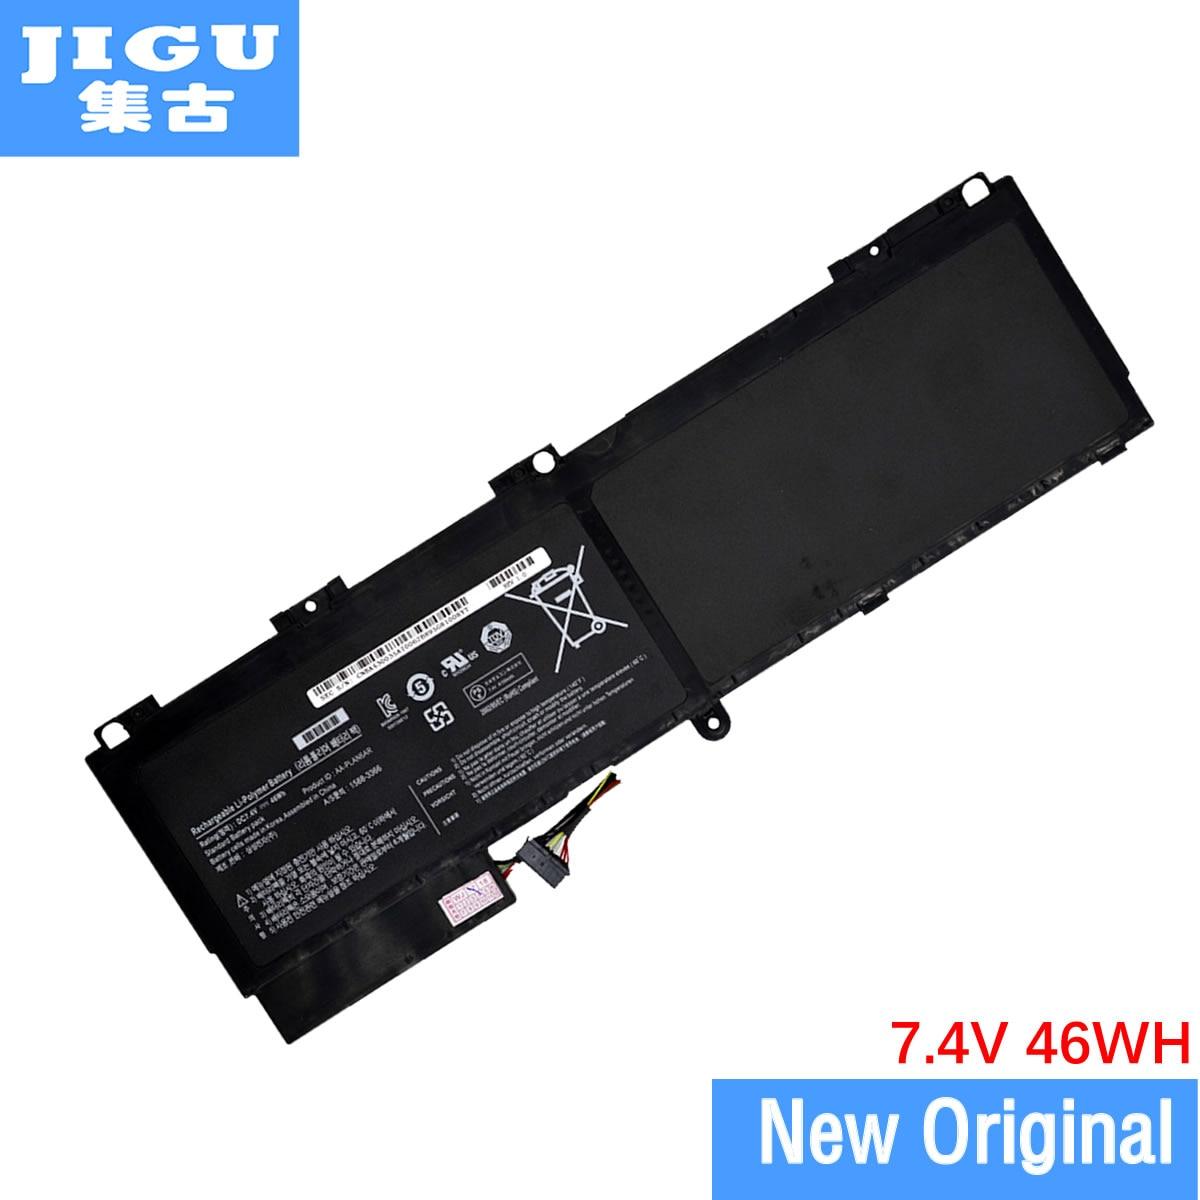 JIGU AAPLAN6AR AA-PLAN6AR Original batería para ordenador portátil SAMSUNG 900X1AA01US 900X3A-01IT B04CH NP900X3A 900X1BA03 serie